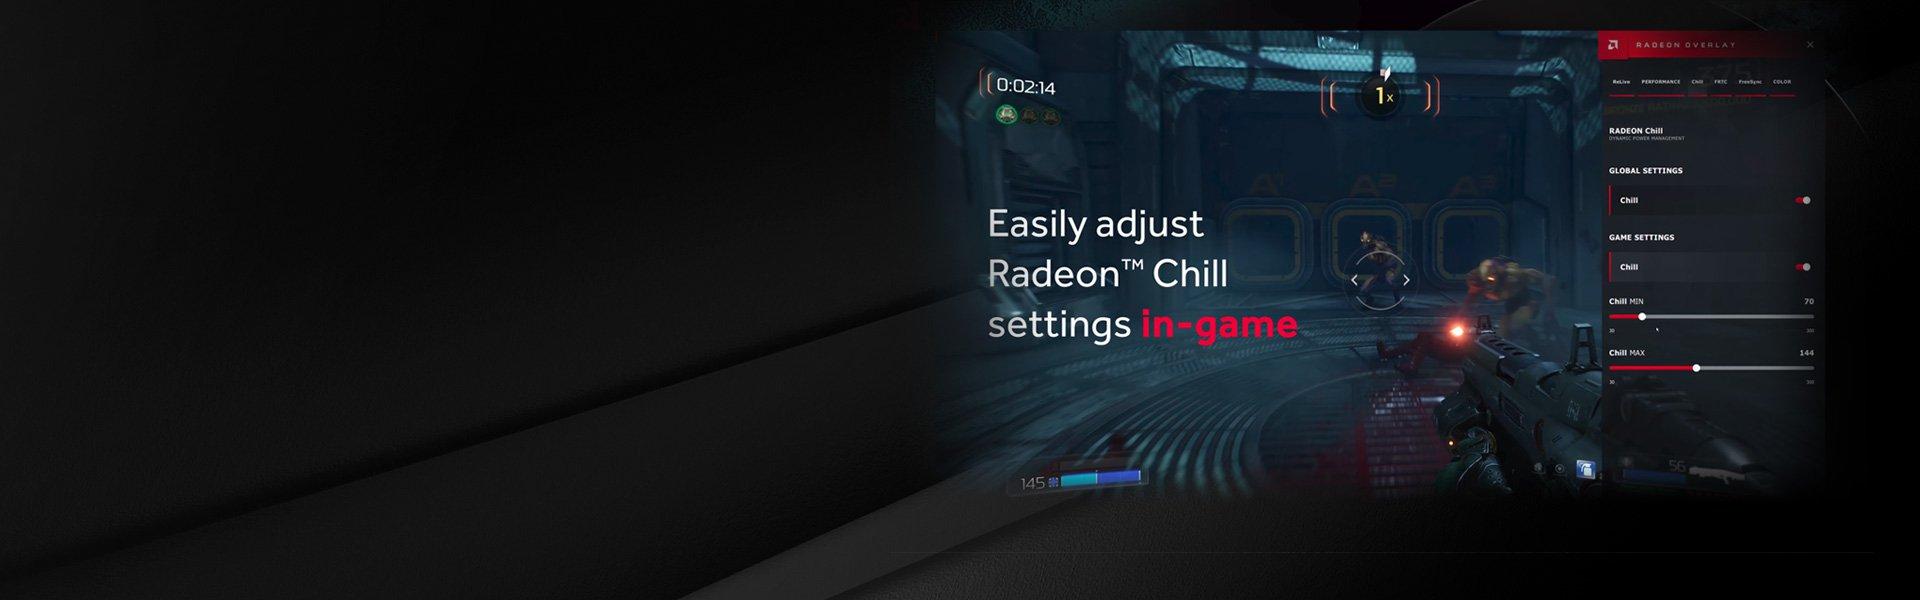 ASRock > AMD Radeon RX500 Series